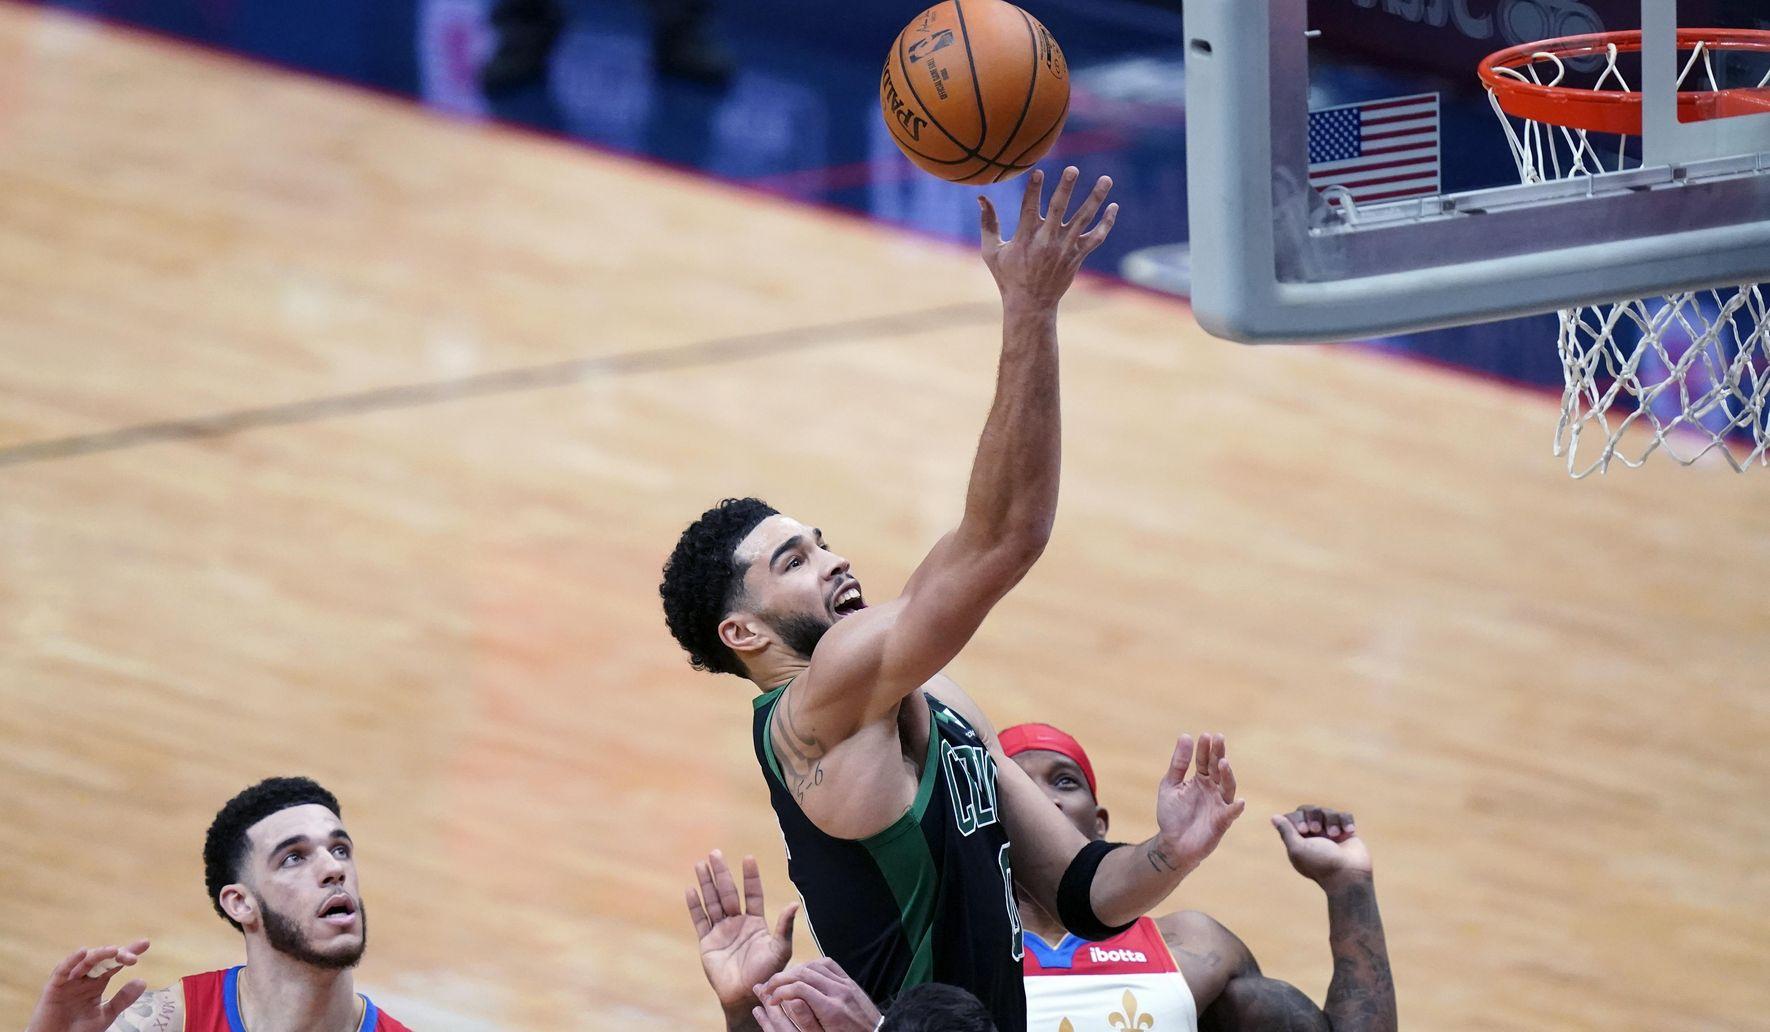 Celtics_pelicans_basketball_14640_c0-227-5425-3390_s1770x1032